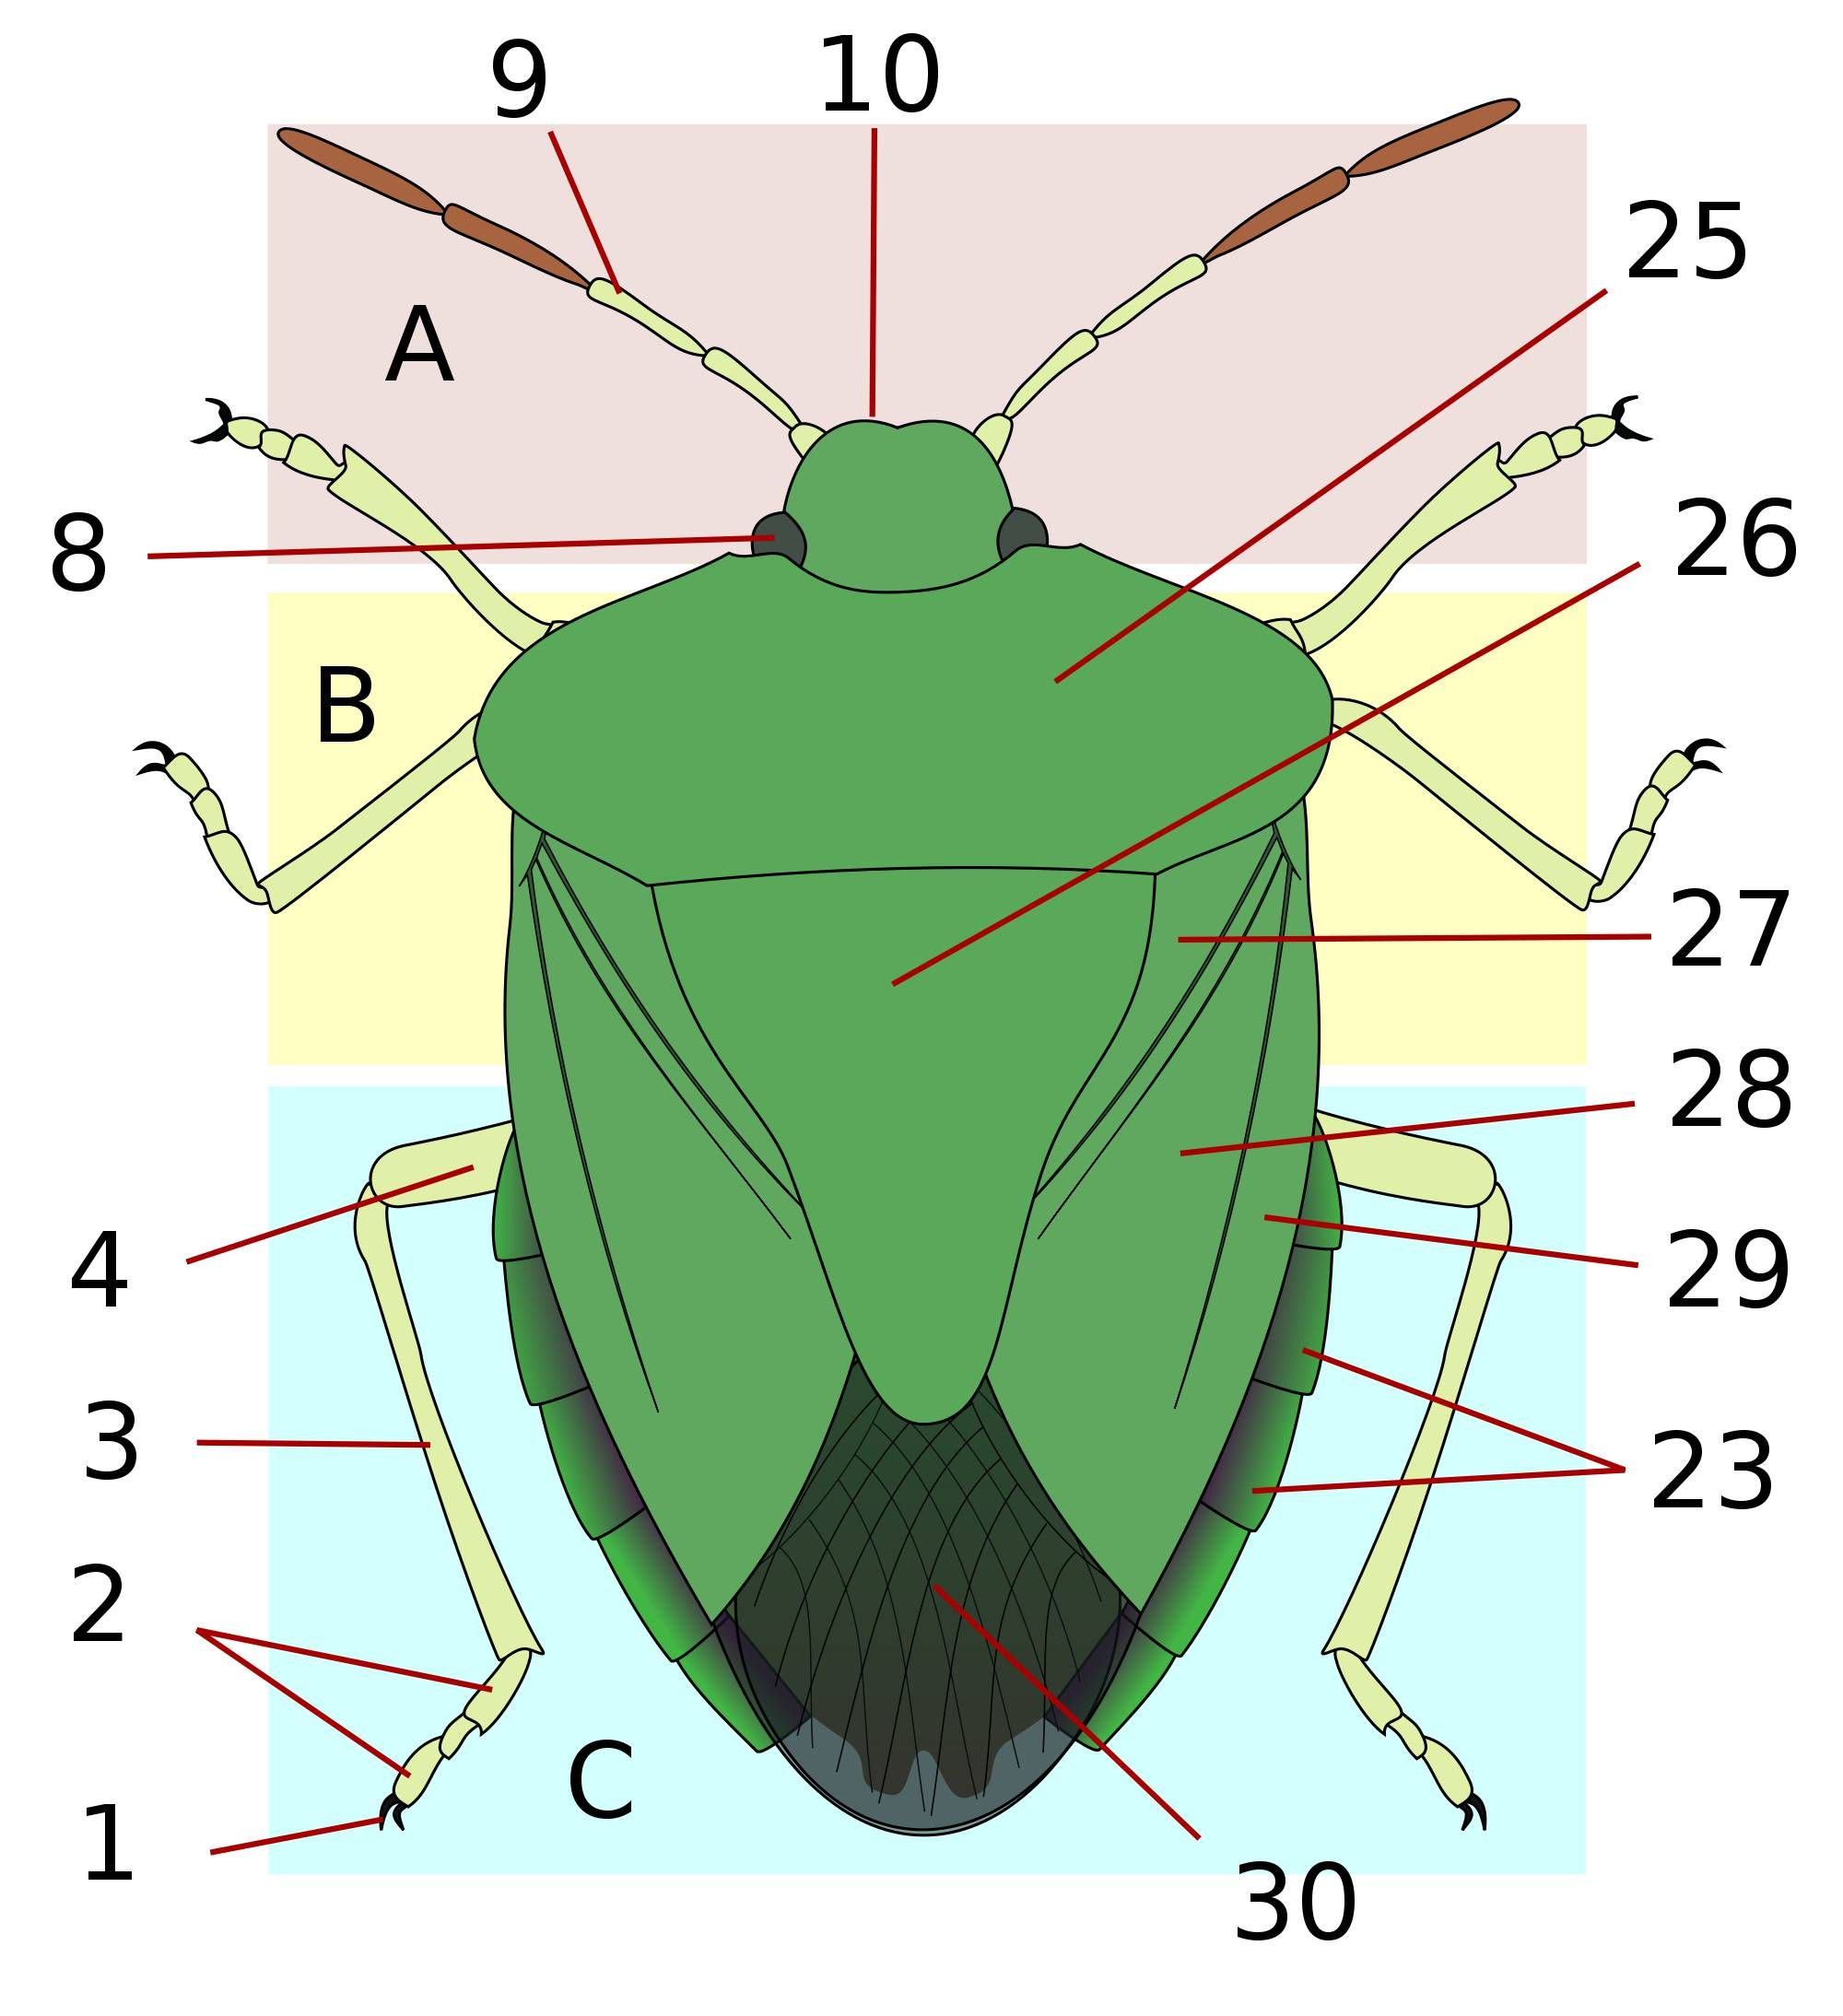 Heteropteran anatomy https://commons.wikimedia.org/wiki/File ...